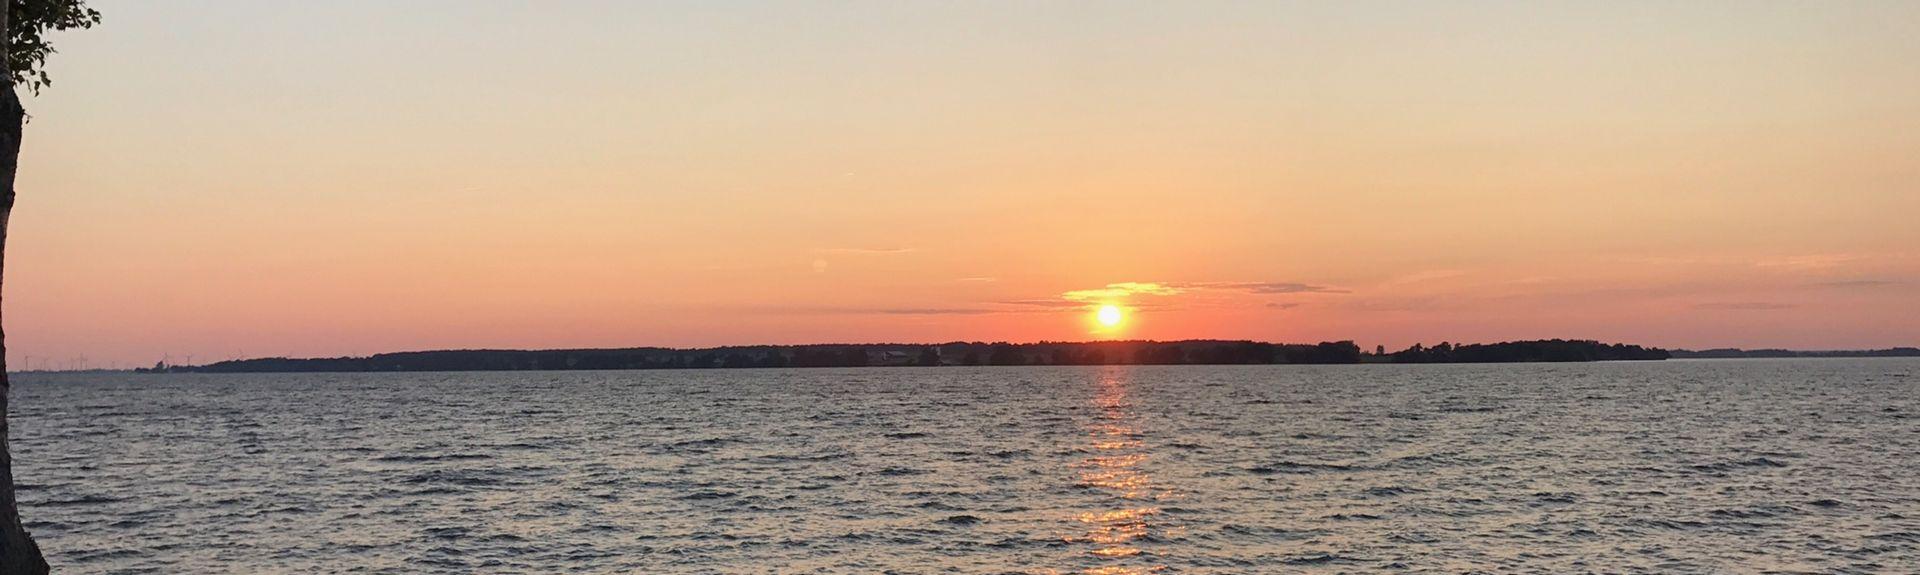 Wellesley Island State Park, Wellesley Island, New York, Stati Uniti d'America